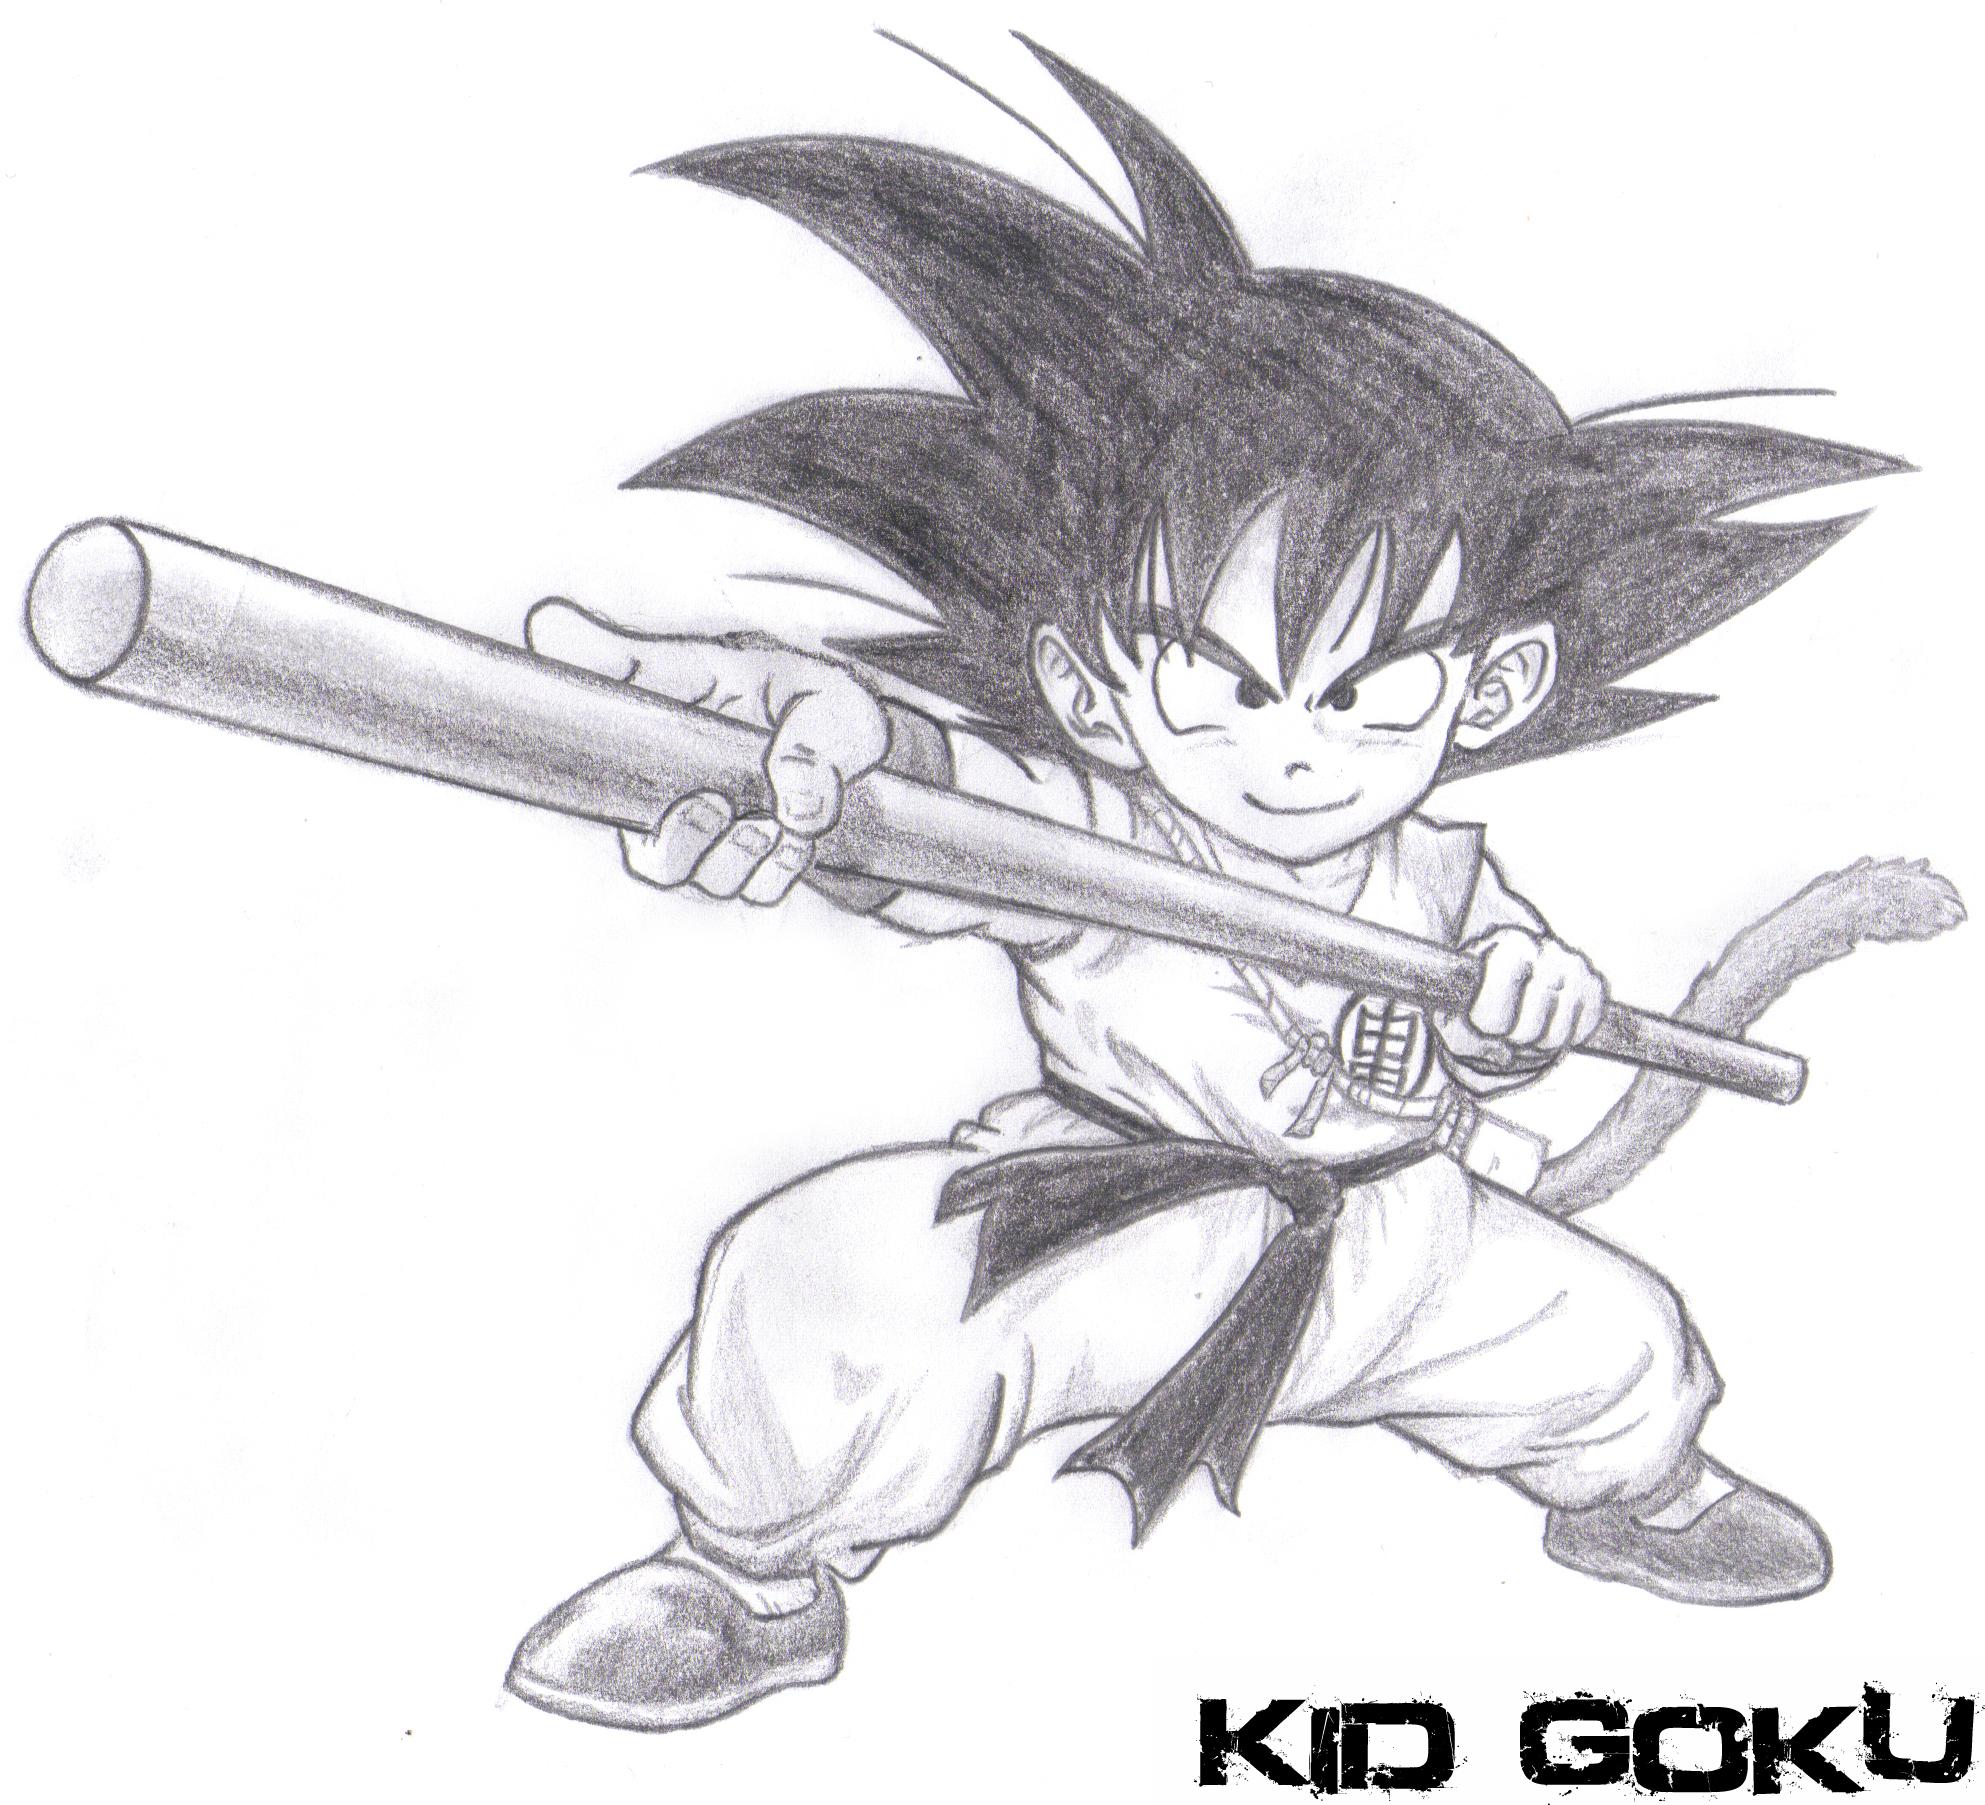 Kid goku pencil drawing by iihurricane on deviantart